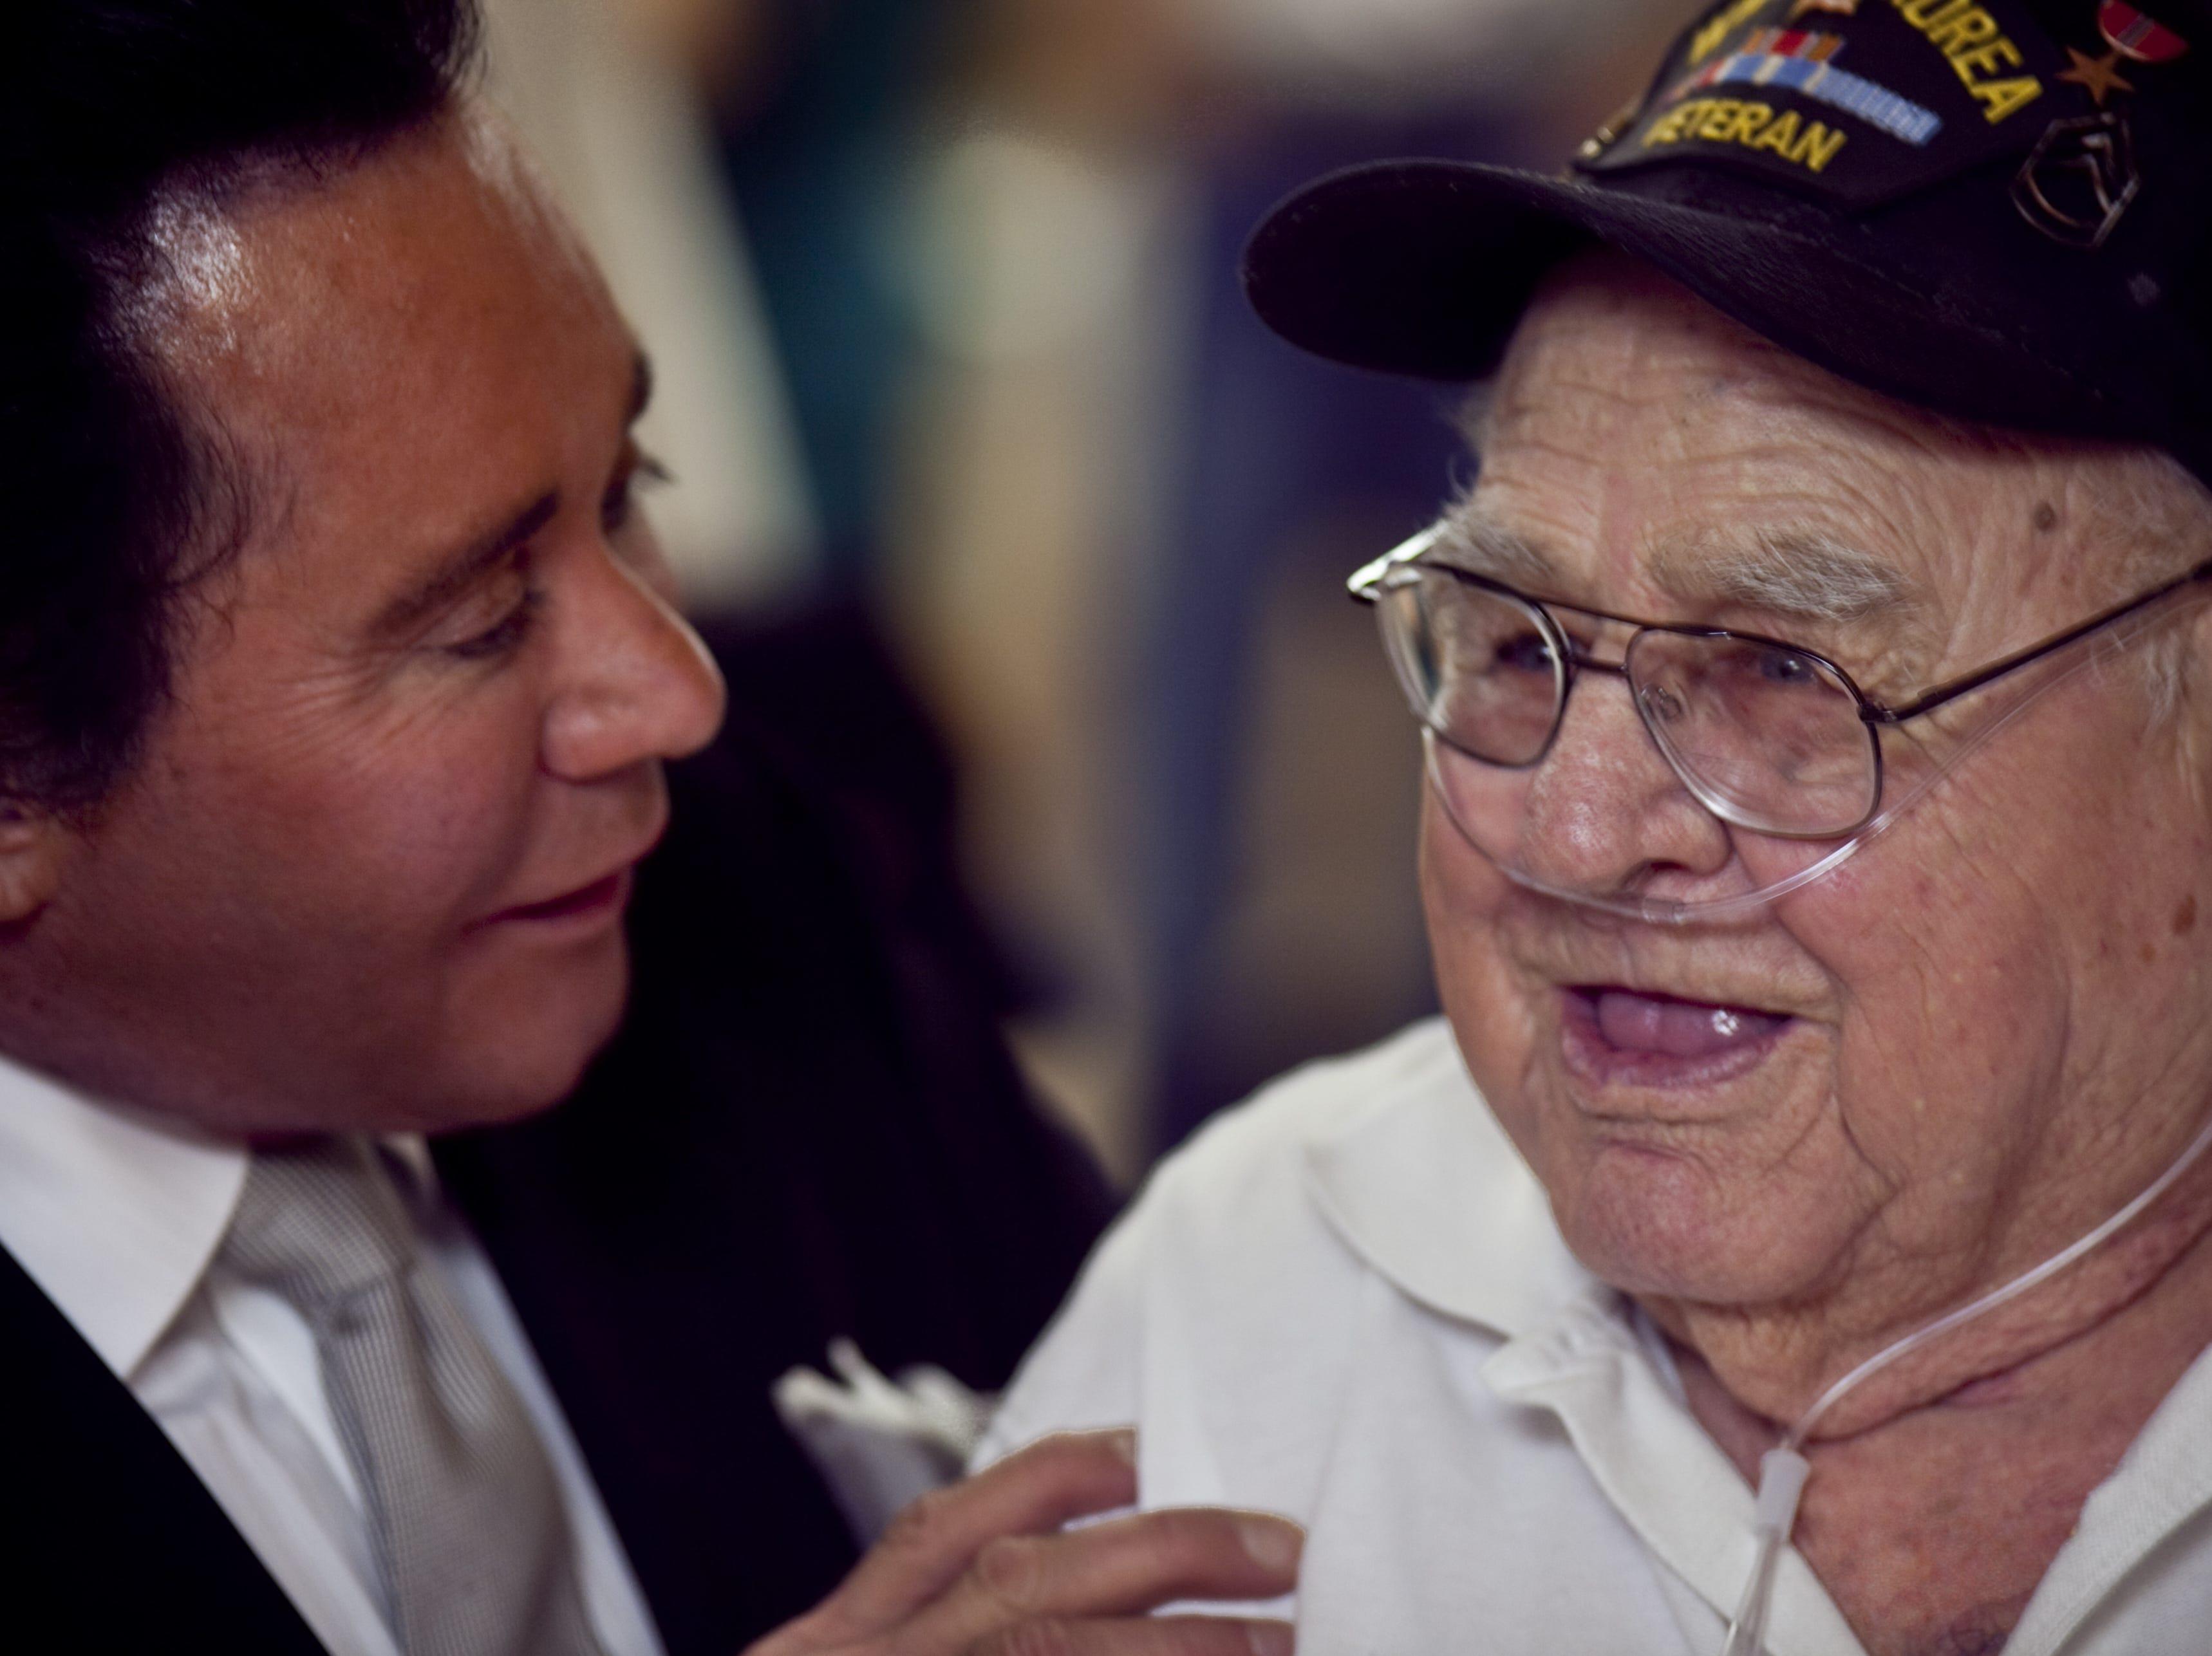 Wayne Newton (left) greets Ira Kile, a veteran of World War II and the Korean War, during a 2009 visit to the VA Community Living Center in Phoenix.